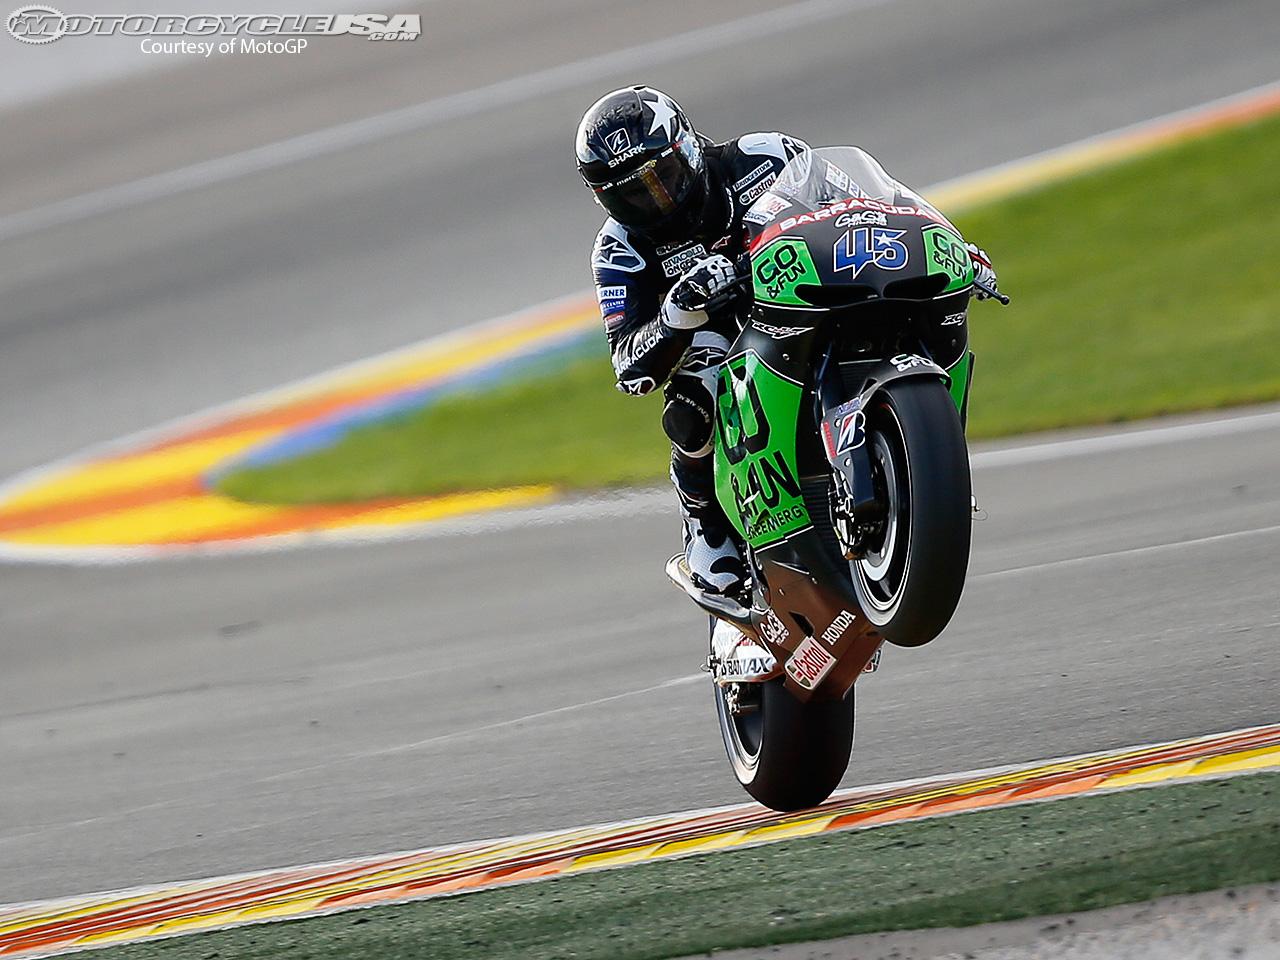 MotoGP -saison 2014- - Page 2 Scott-Redding-MotoGP-2014